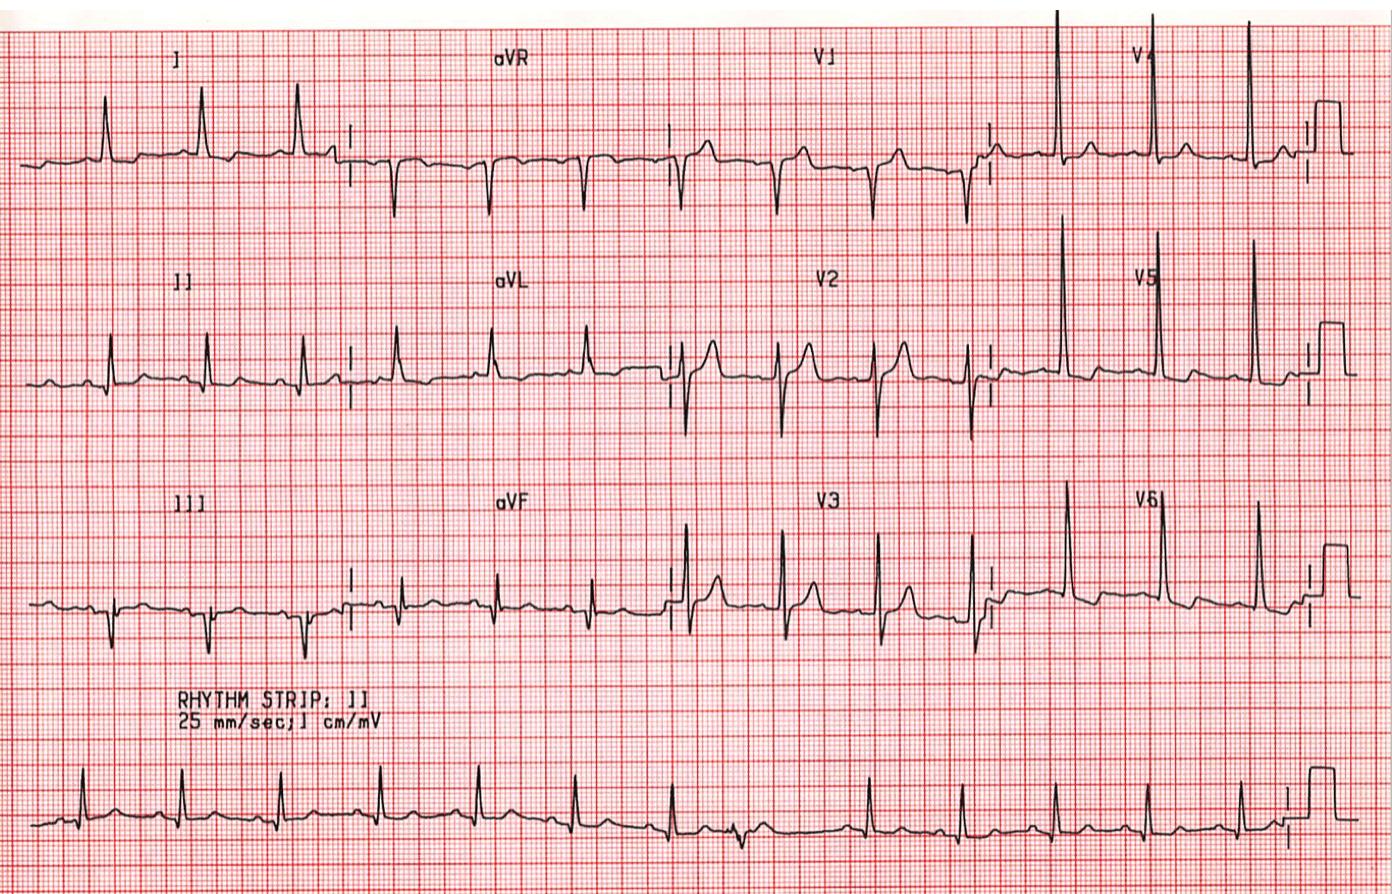 case a4  old inferior infarction  left ventricular hypertrophy  st emlyn u0026 39 s ecg library   u2022 st emlyn u0026 39 s